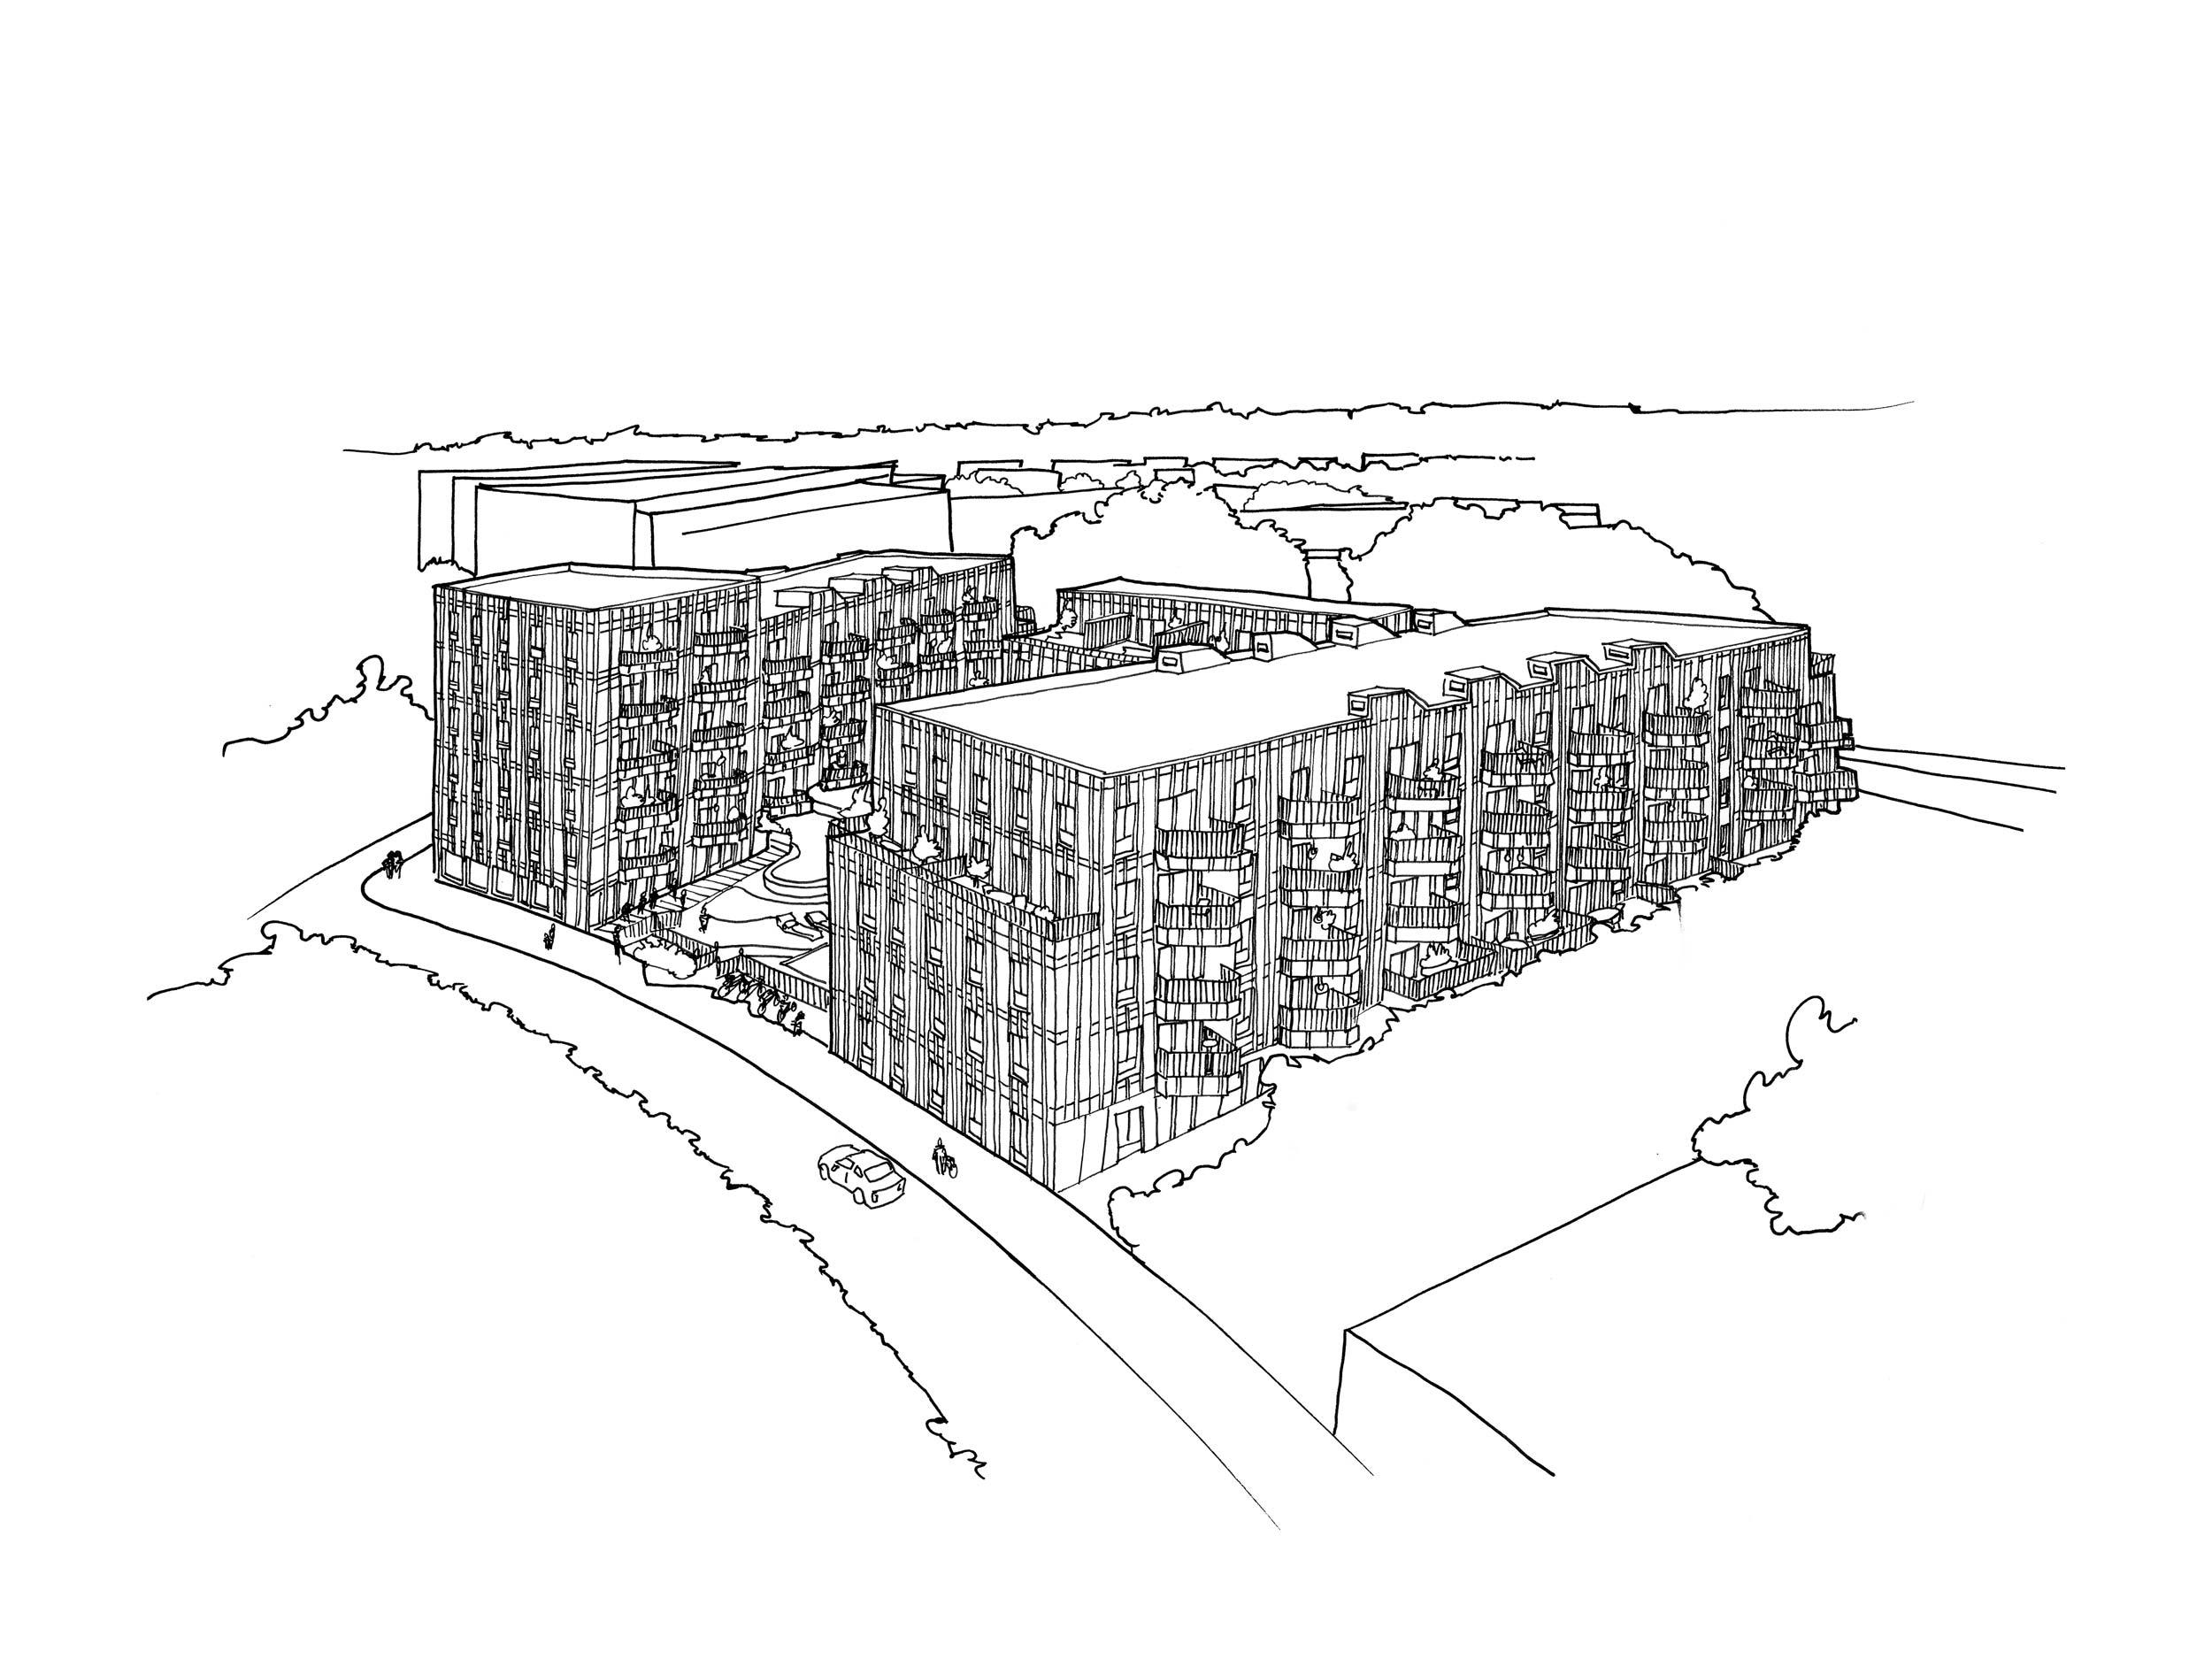 Alex-Kaiser-Different-illustration-CGI-london-visualisation-architecture-02.jpg